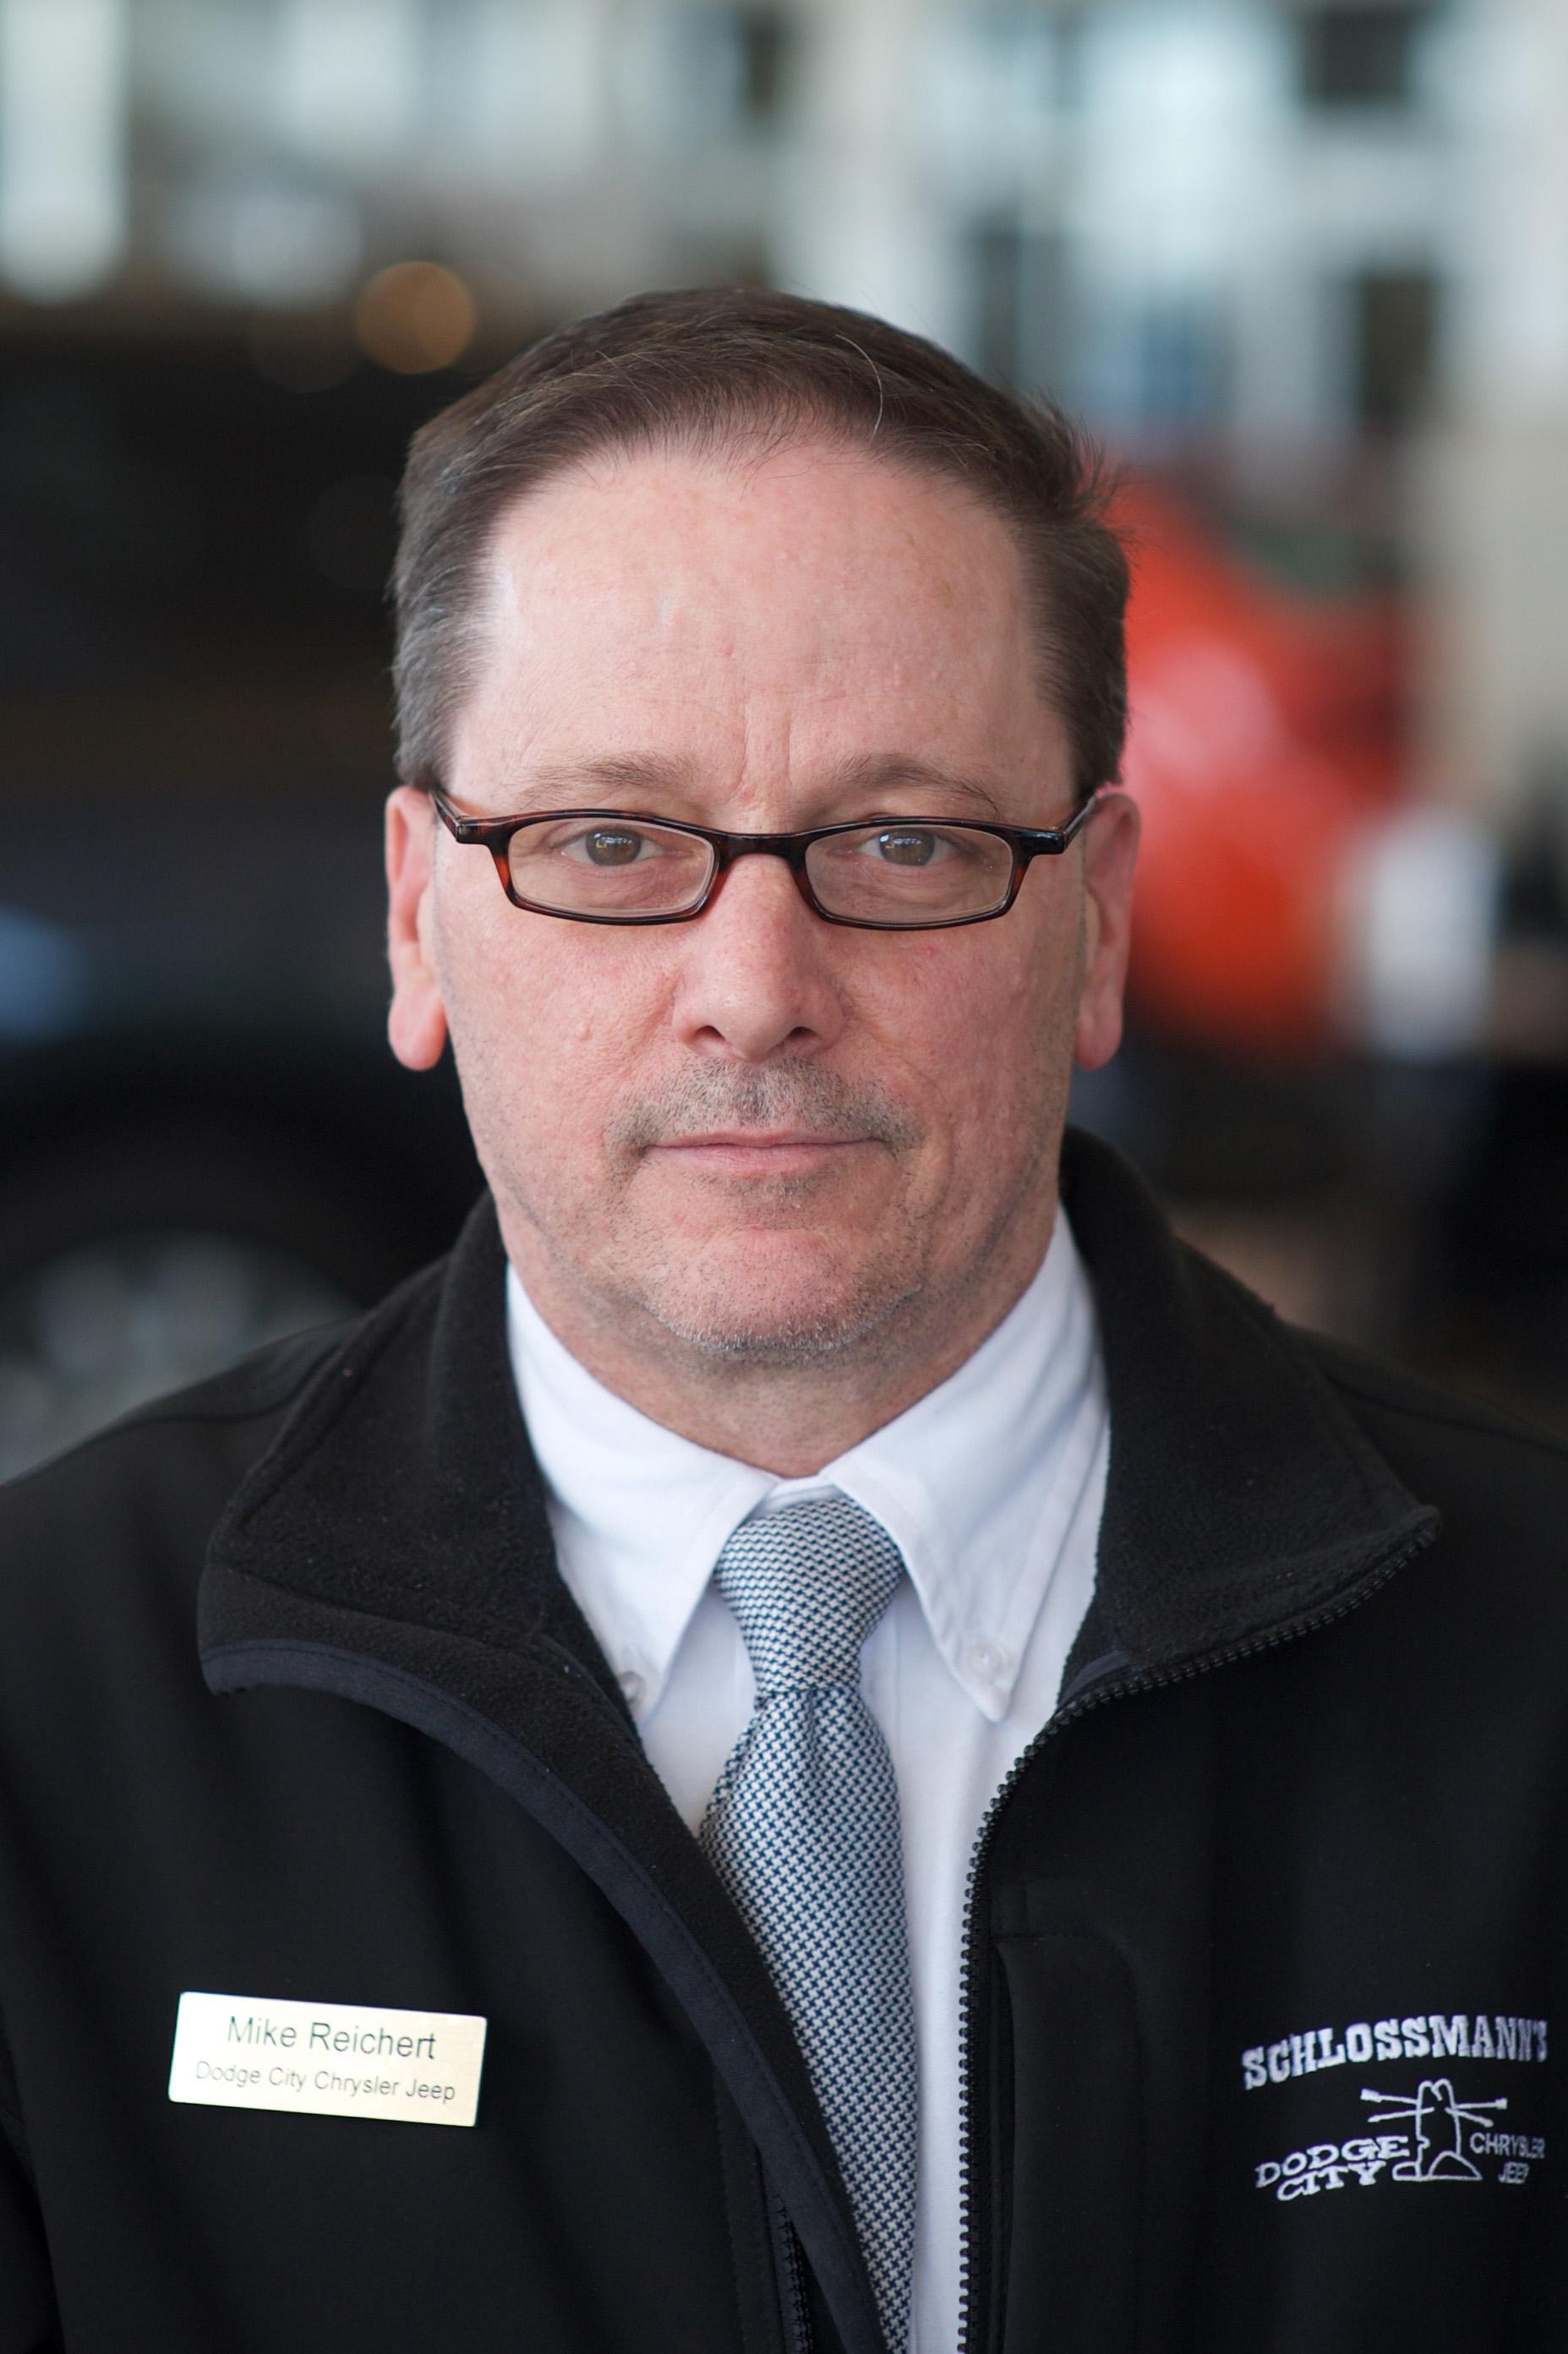 Mike Reichert